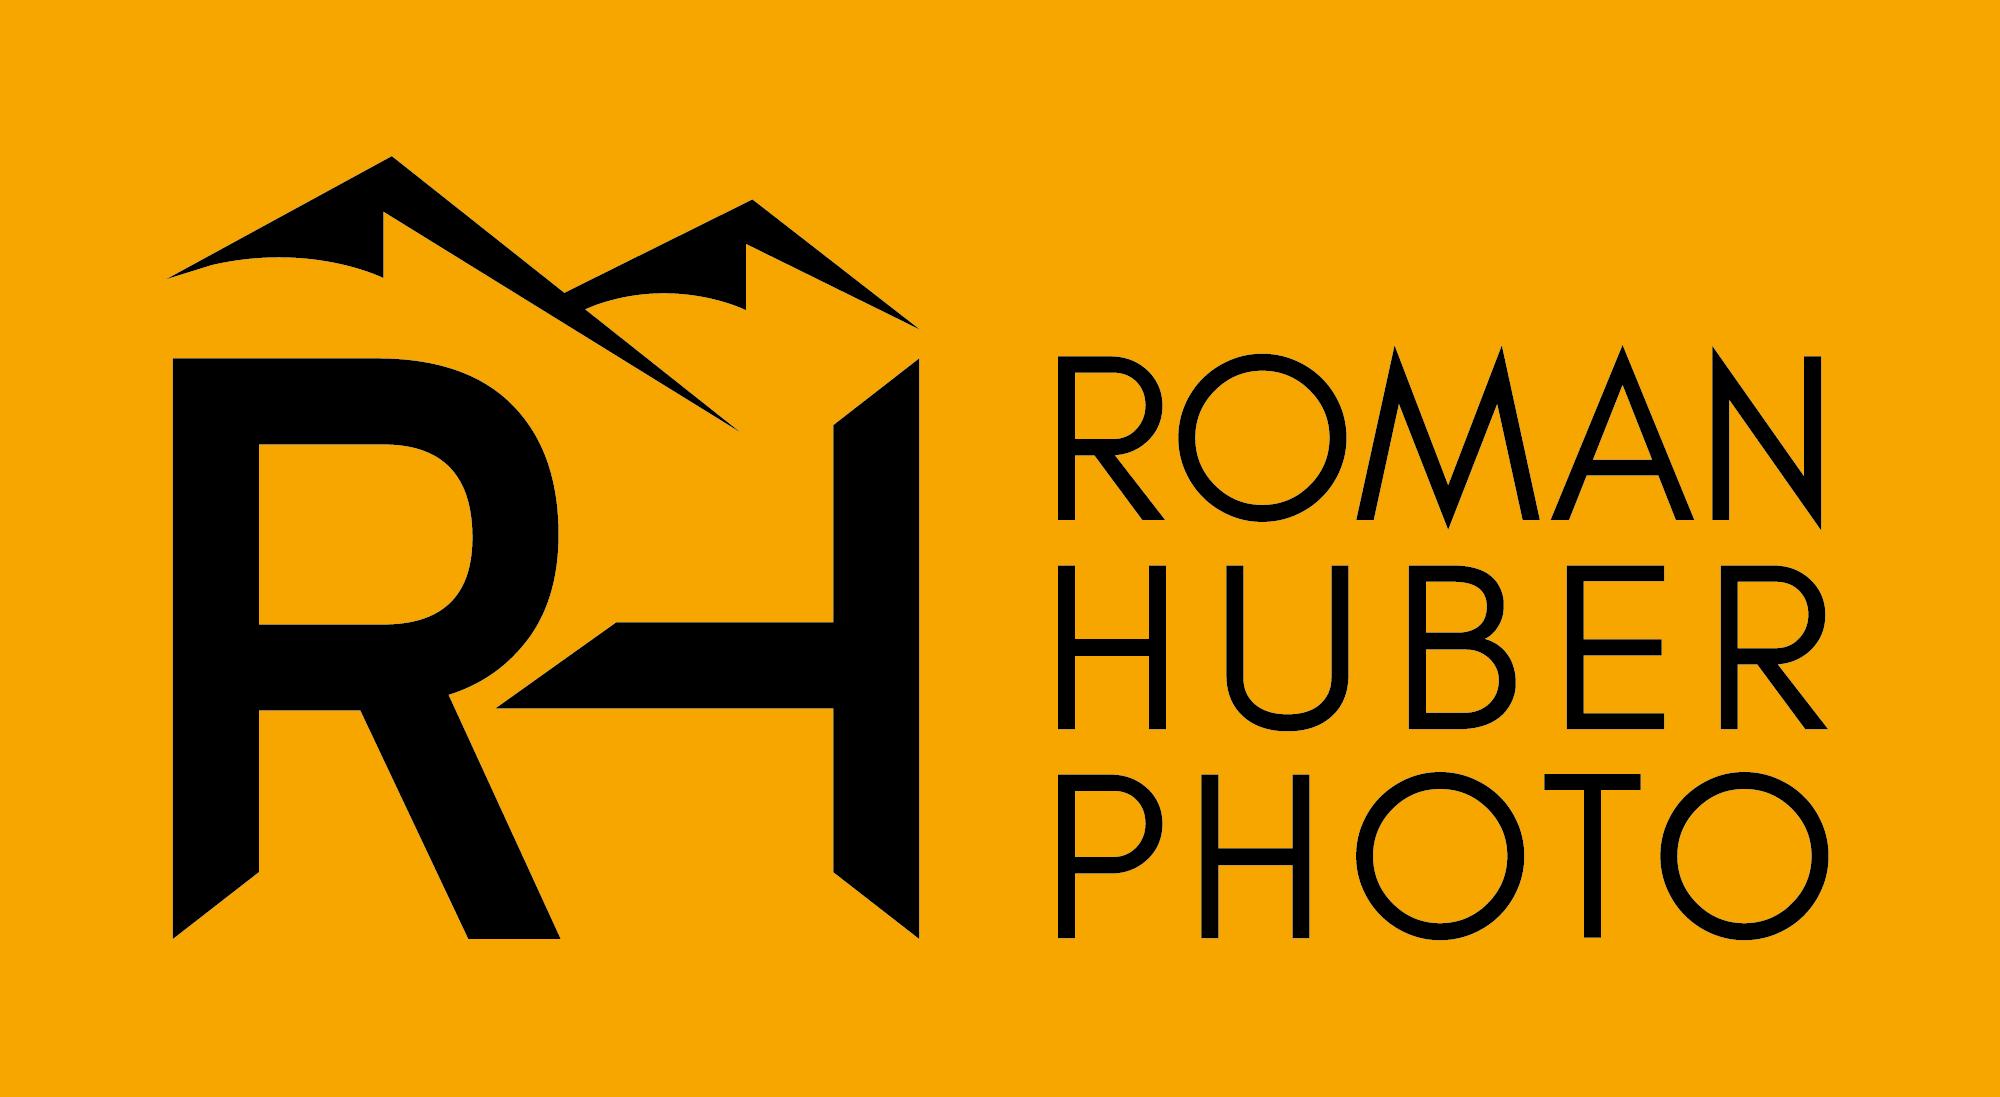 Roman Huber symbol